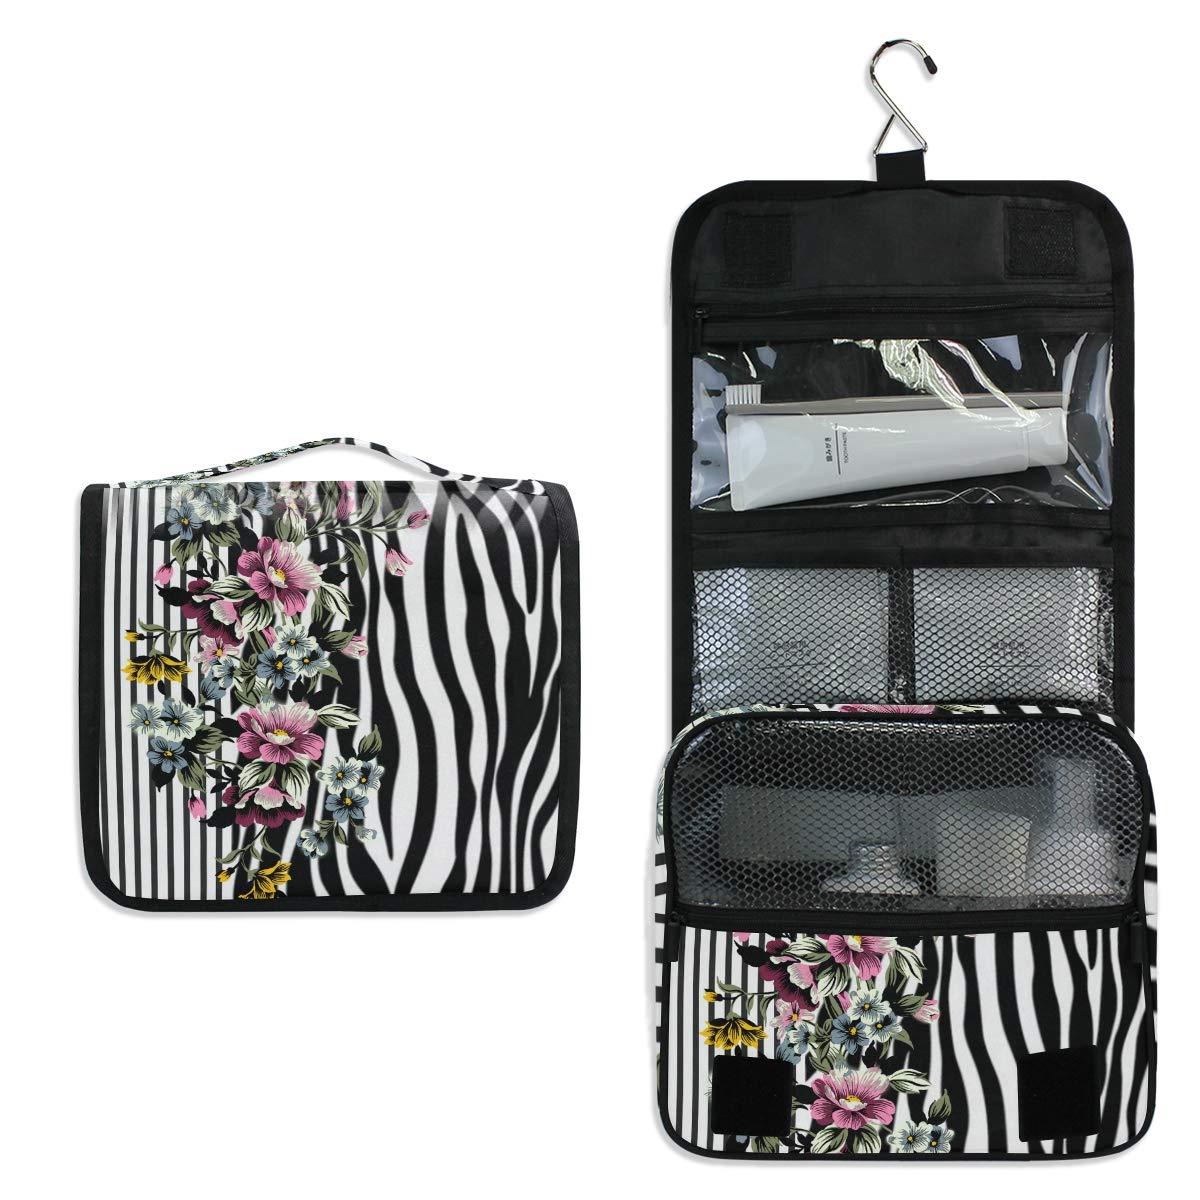 Bardic Hanging Travel Toiletry Bag Flower Zebra Print Stripe Large Capacity Makeup Cosmetic Bag Portable Toiletry Kit Organizer